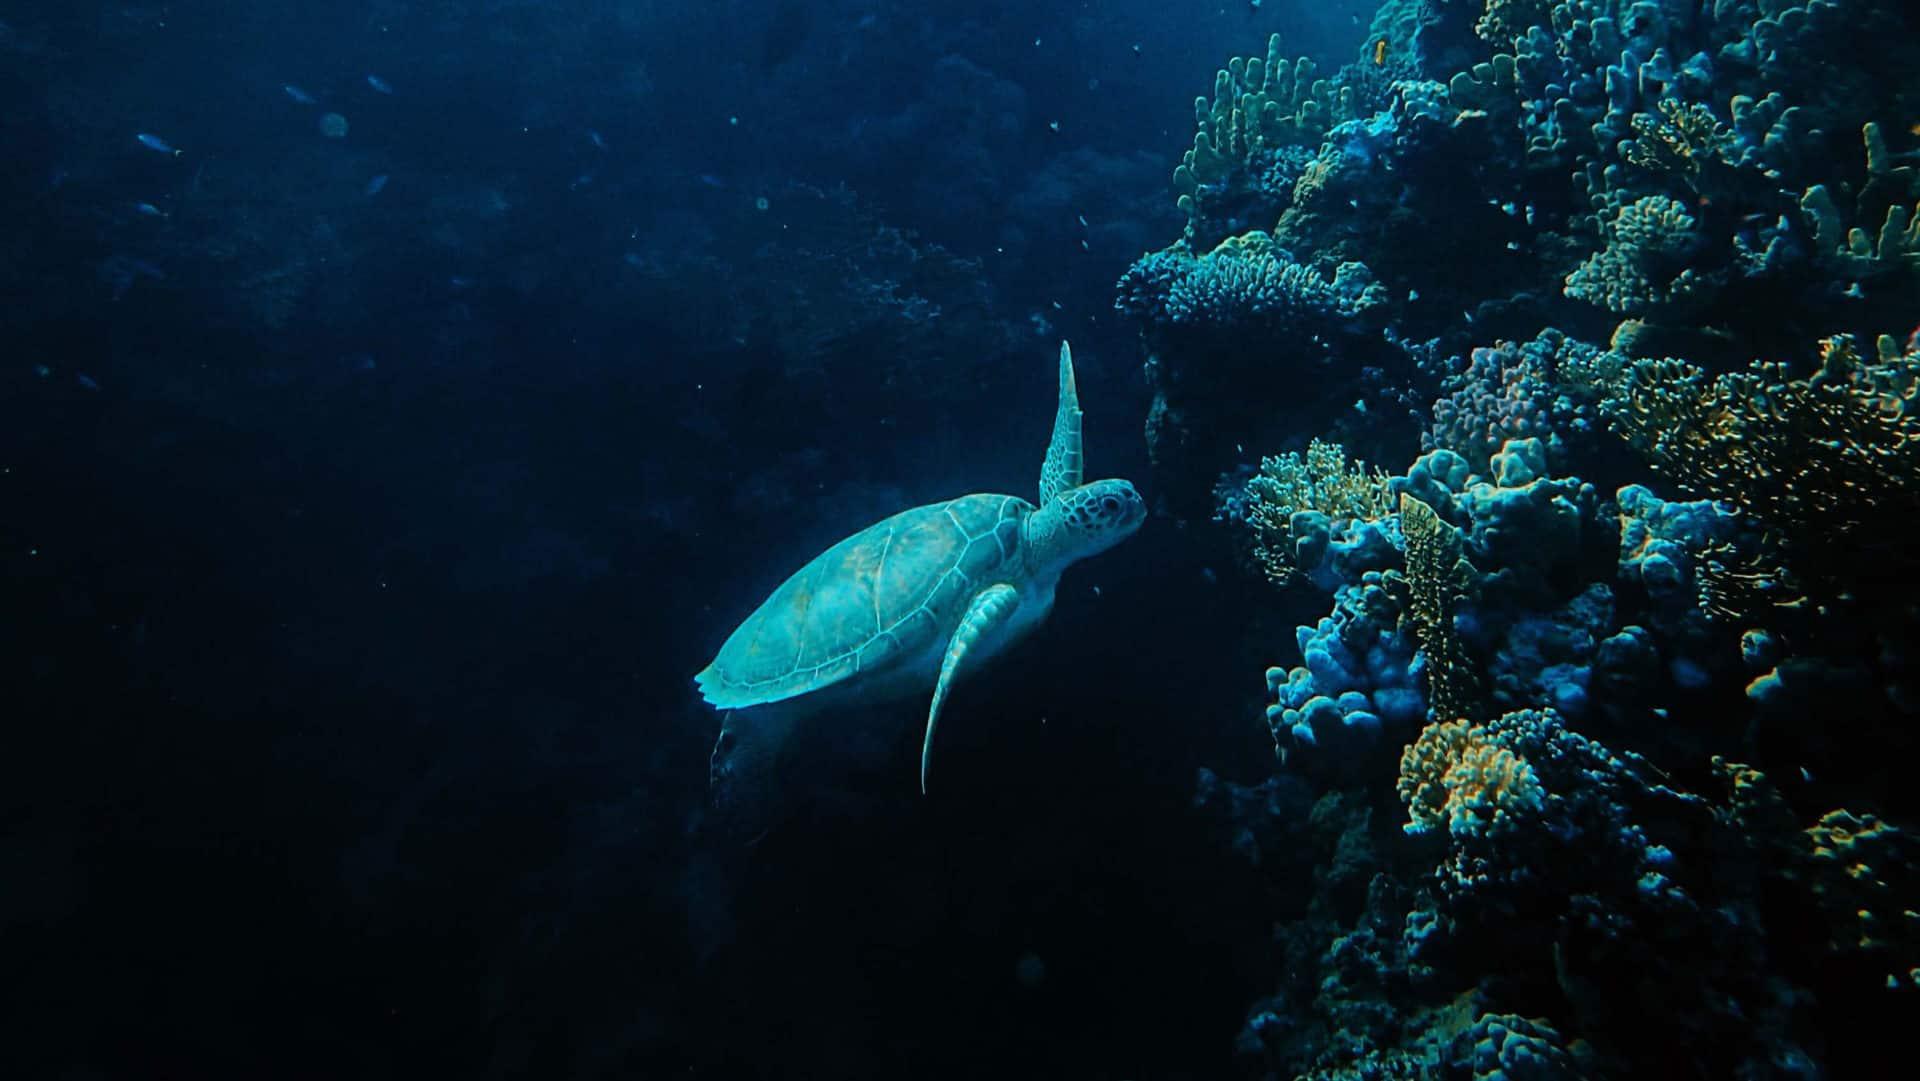 Tartaruga marinha nadando próxima à corais. Foto: Francesco Ungaro